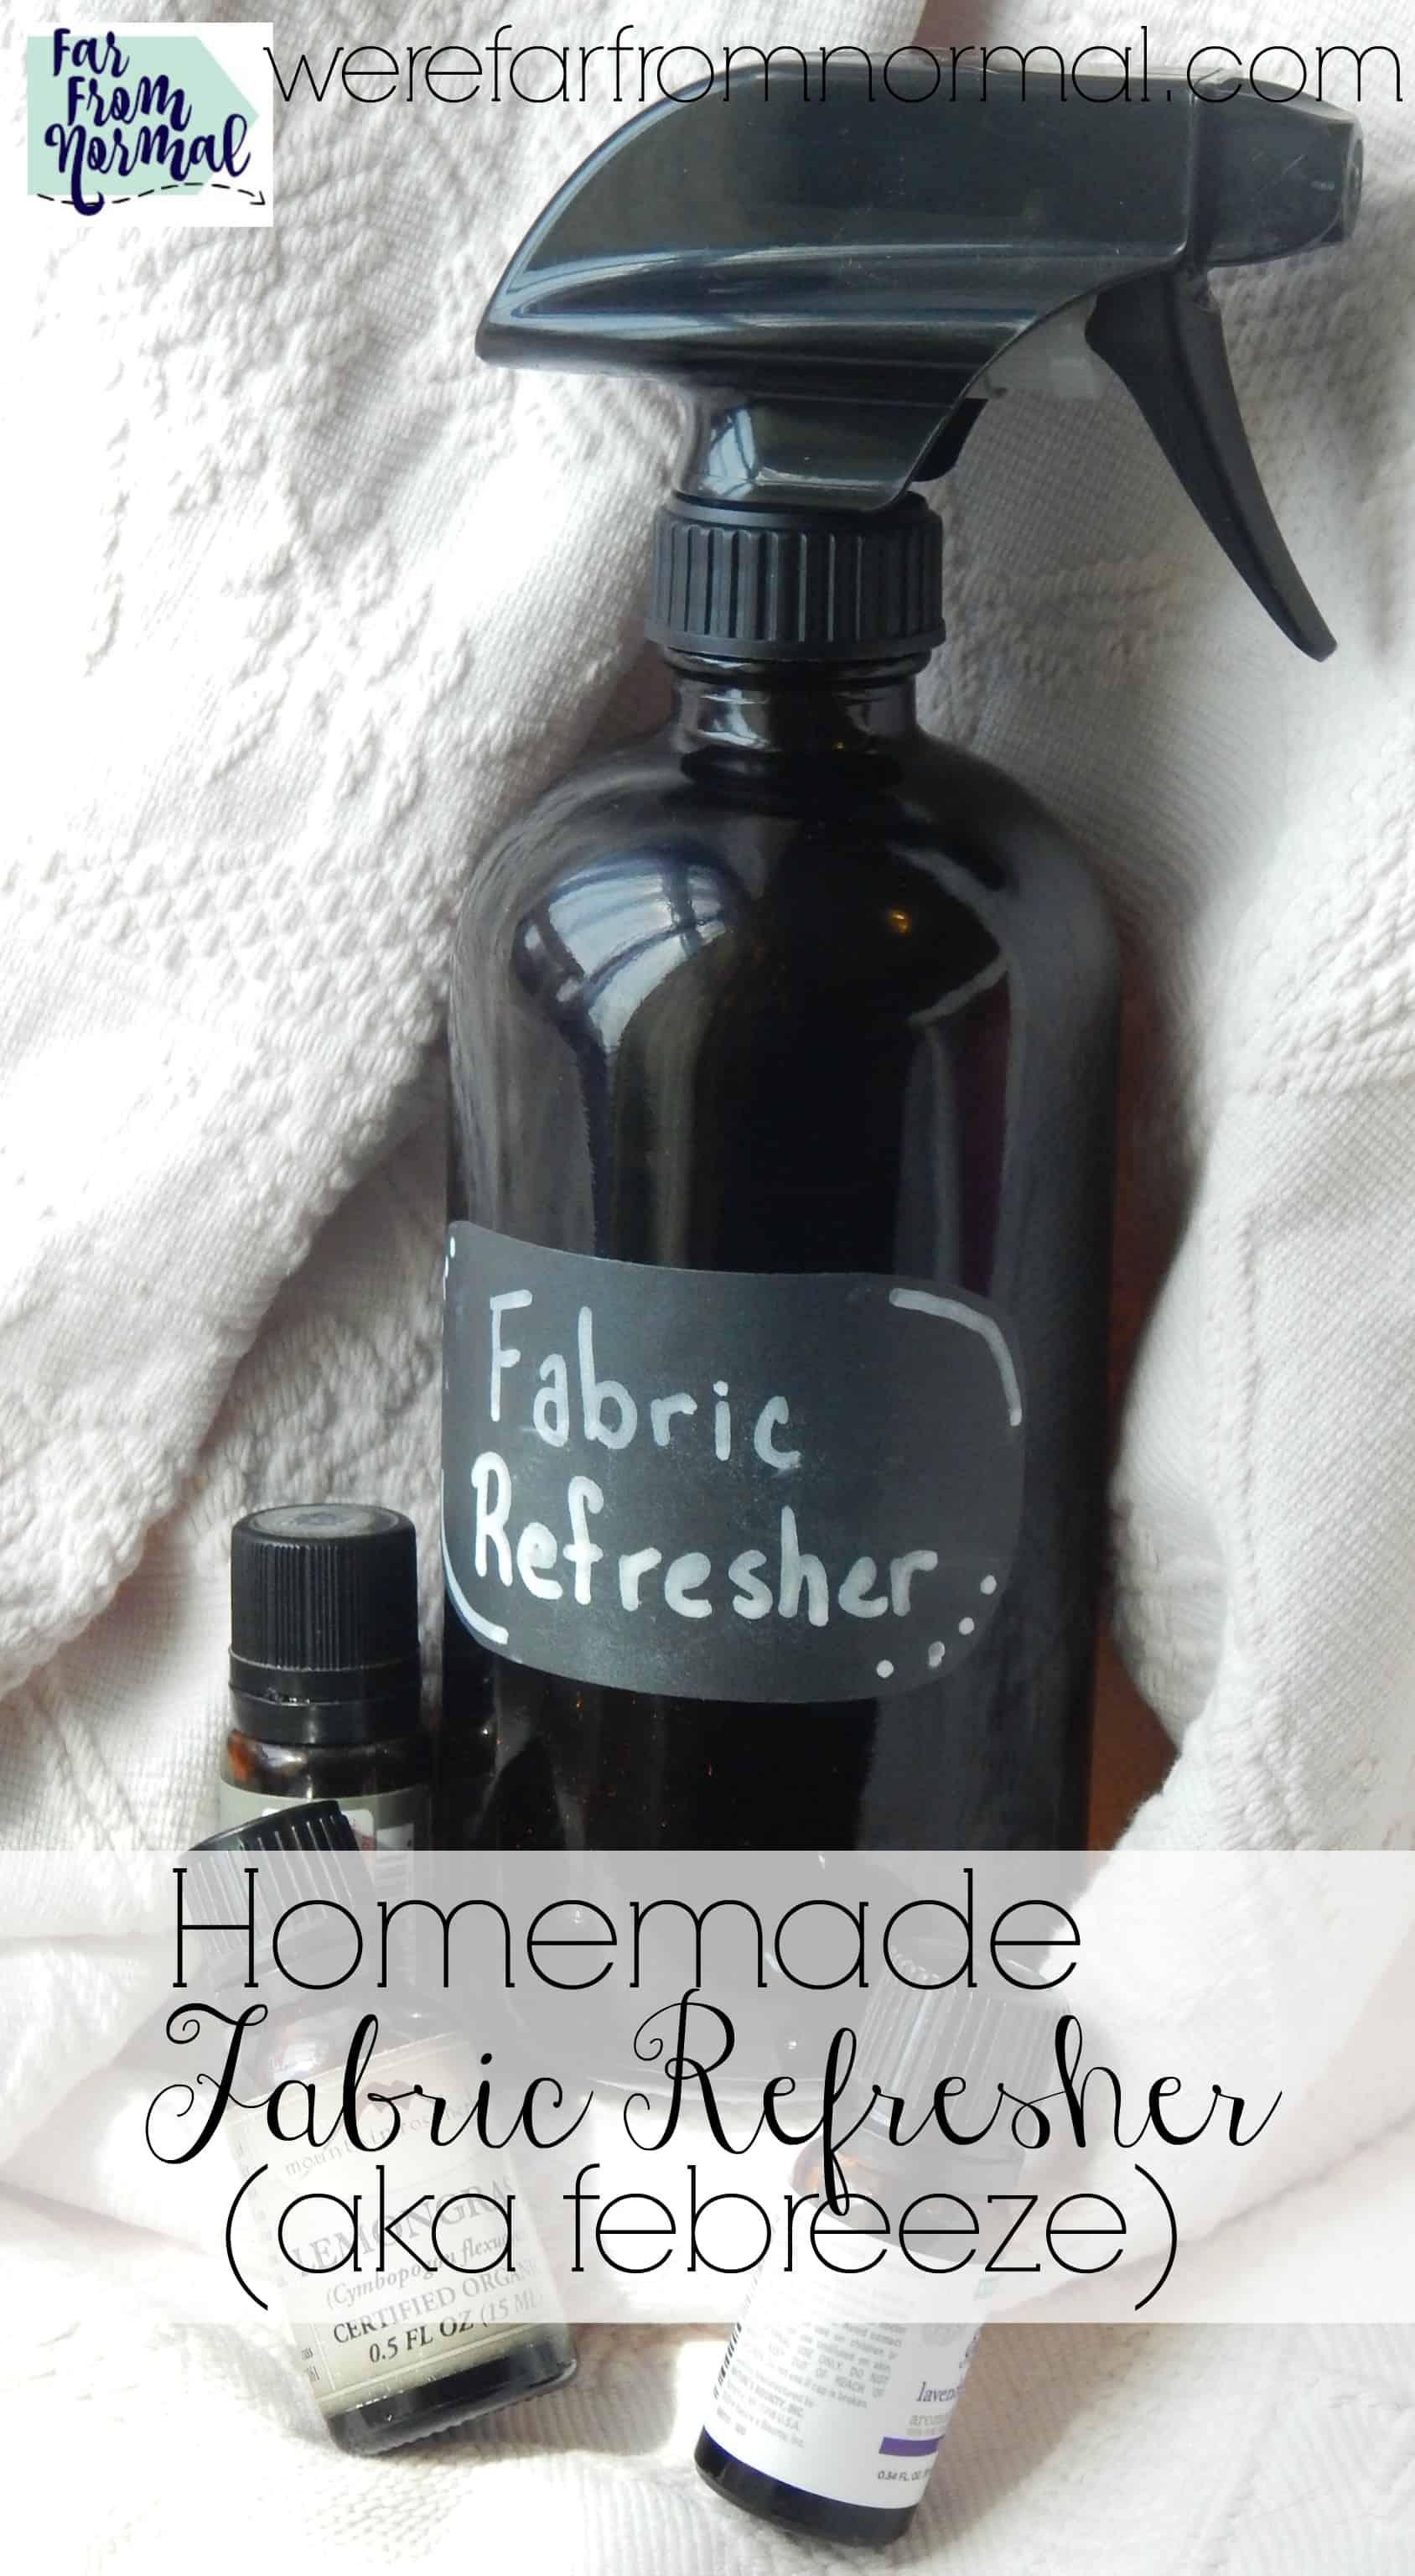 Homemade Fabric Refresher (aka Febreeze)